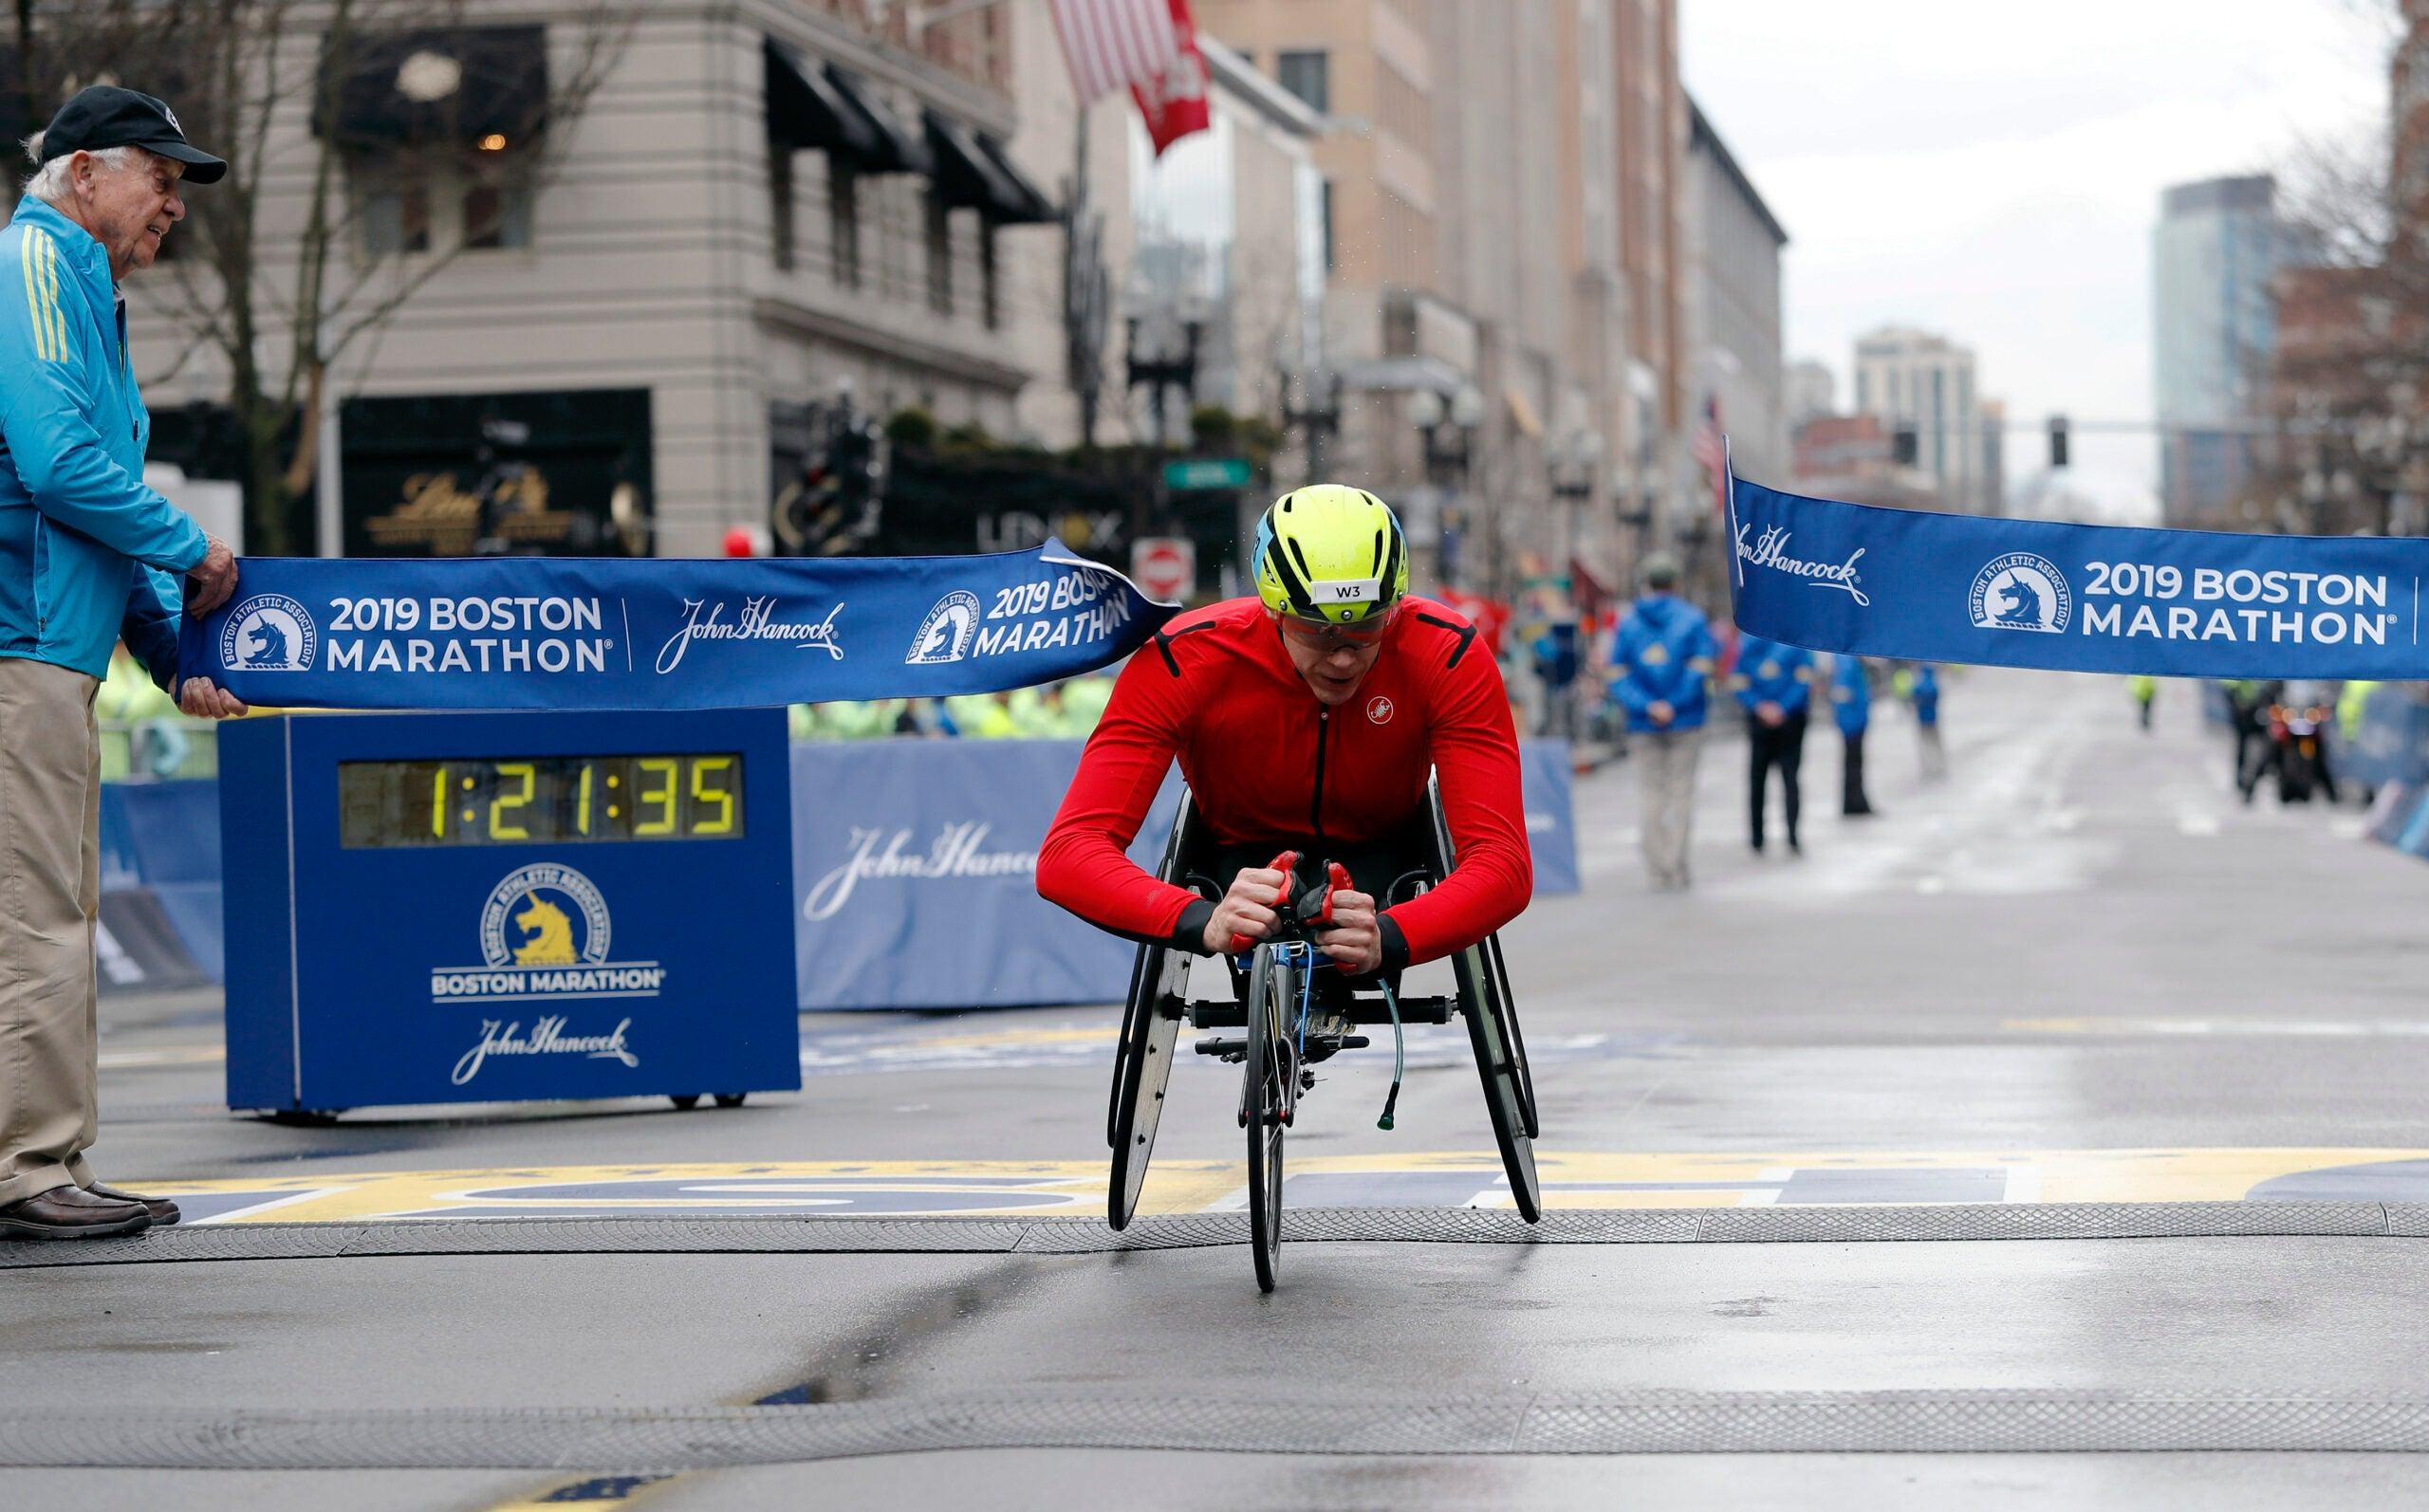 Daniel Romanchuk 2019 Boston Marathon Handcycle